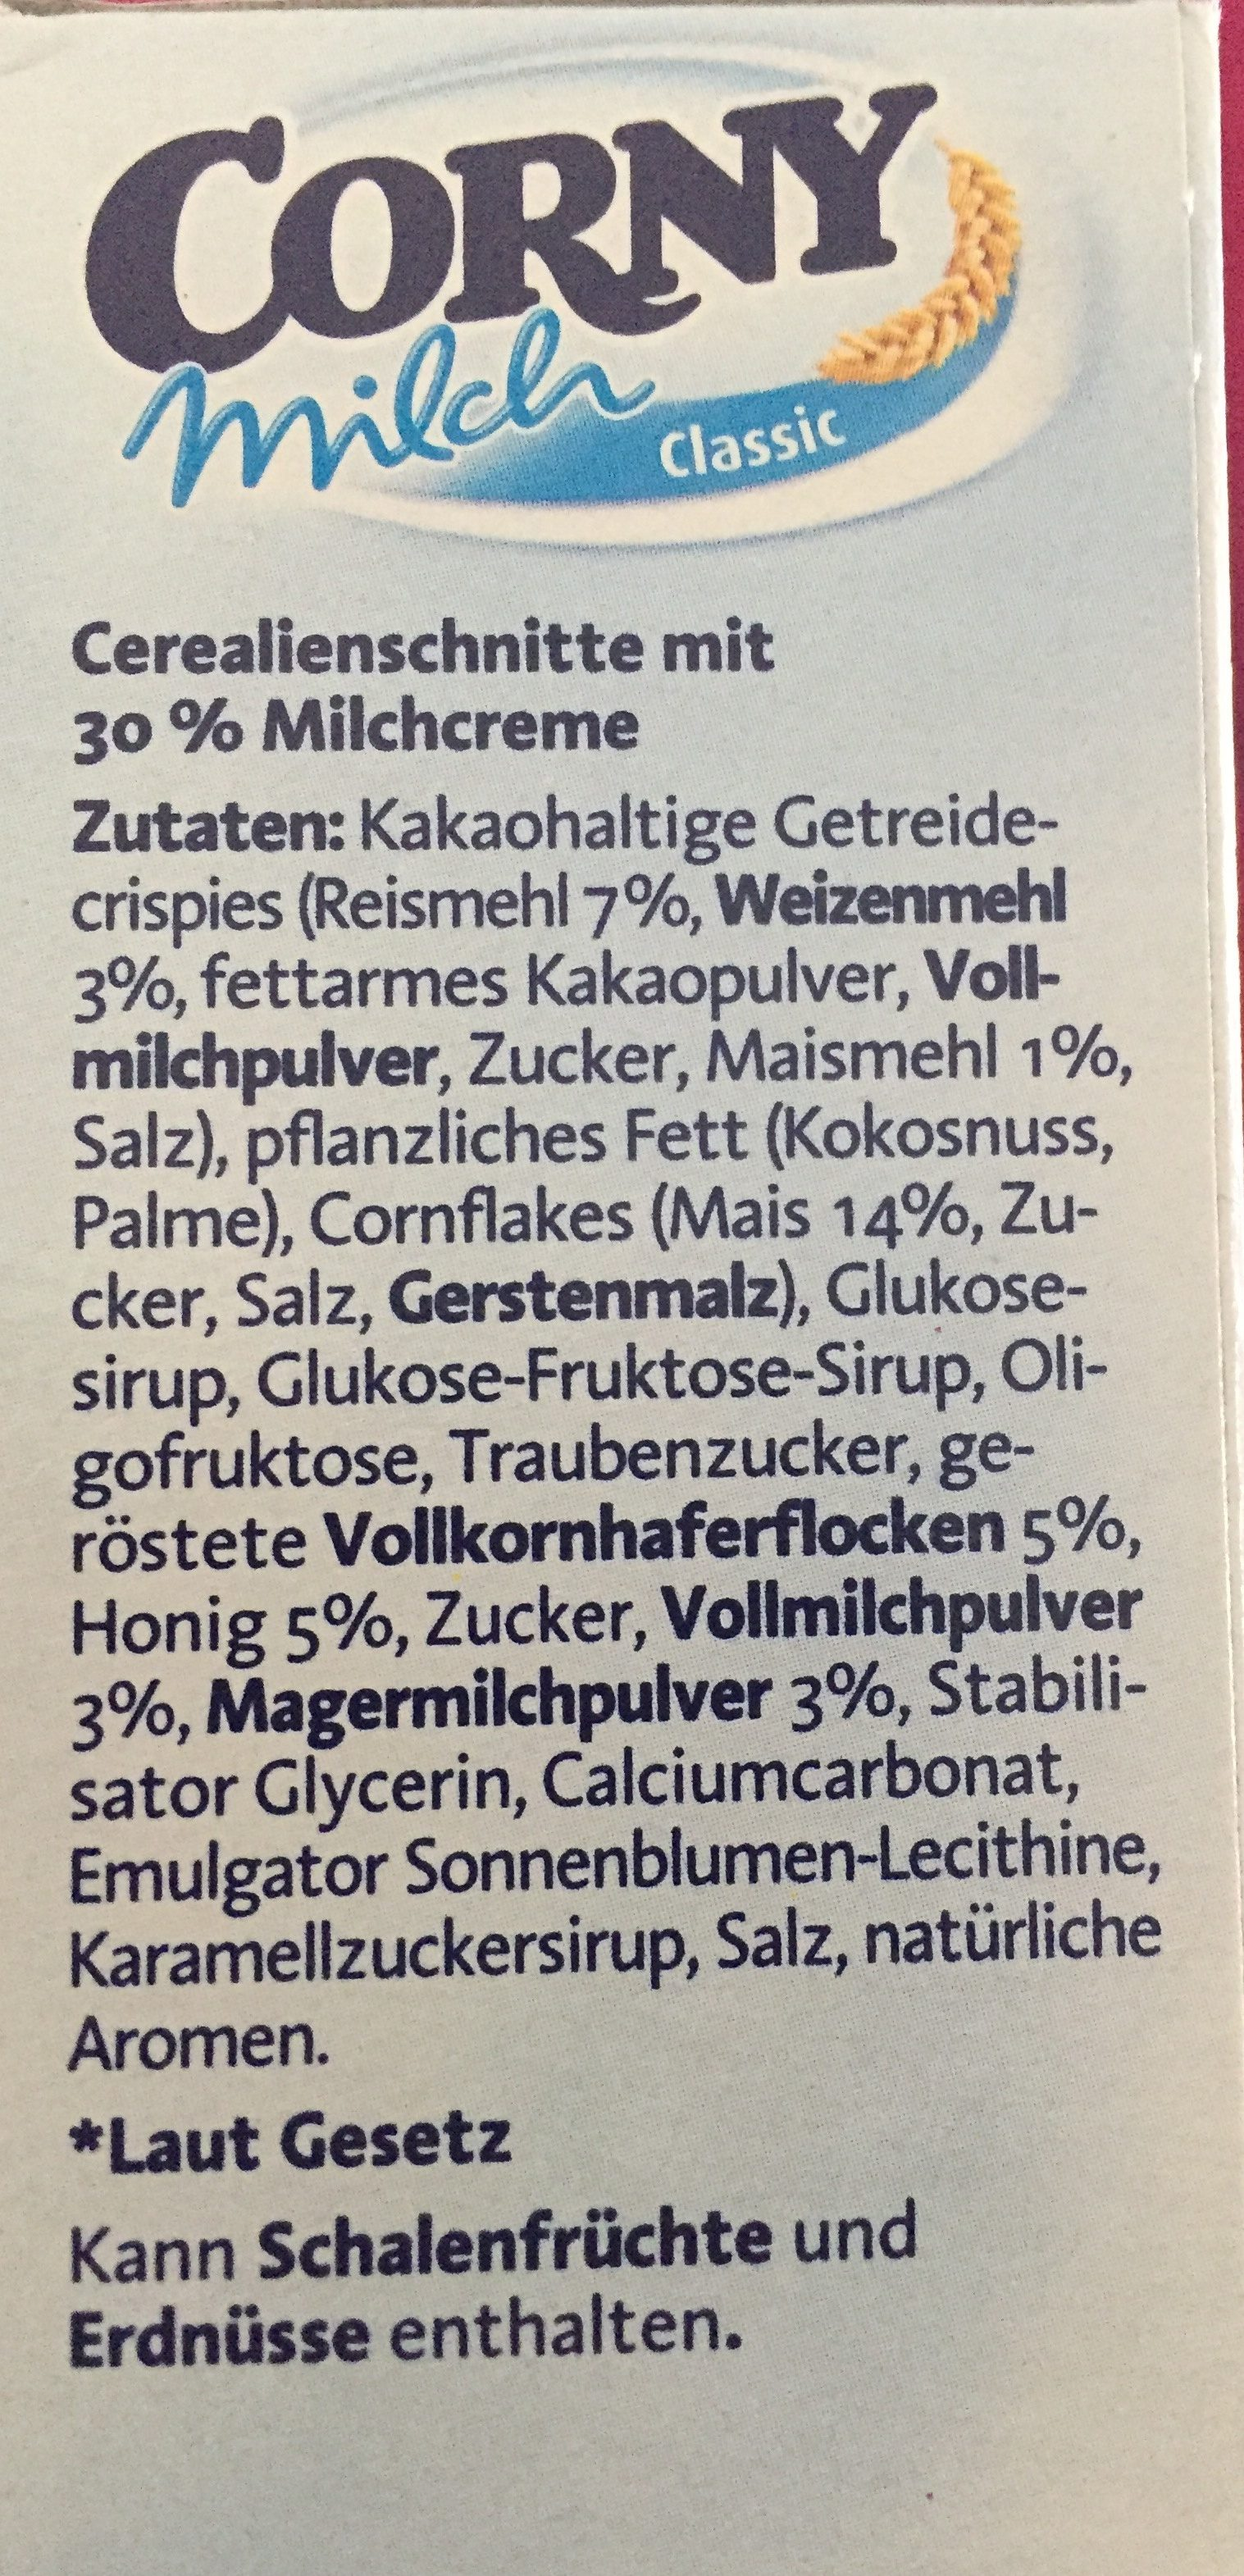 Corny Milch classic - Ingredientes - fr